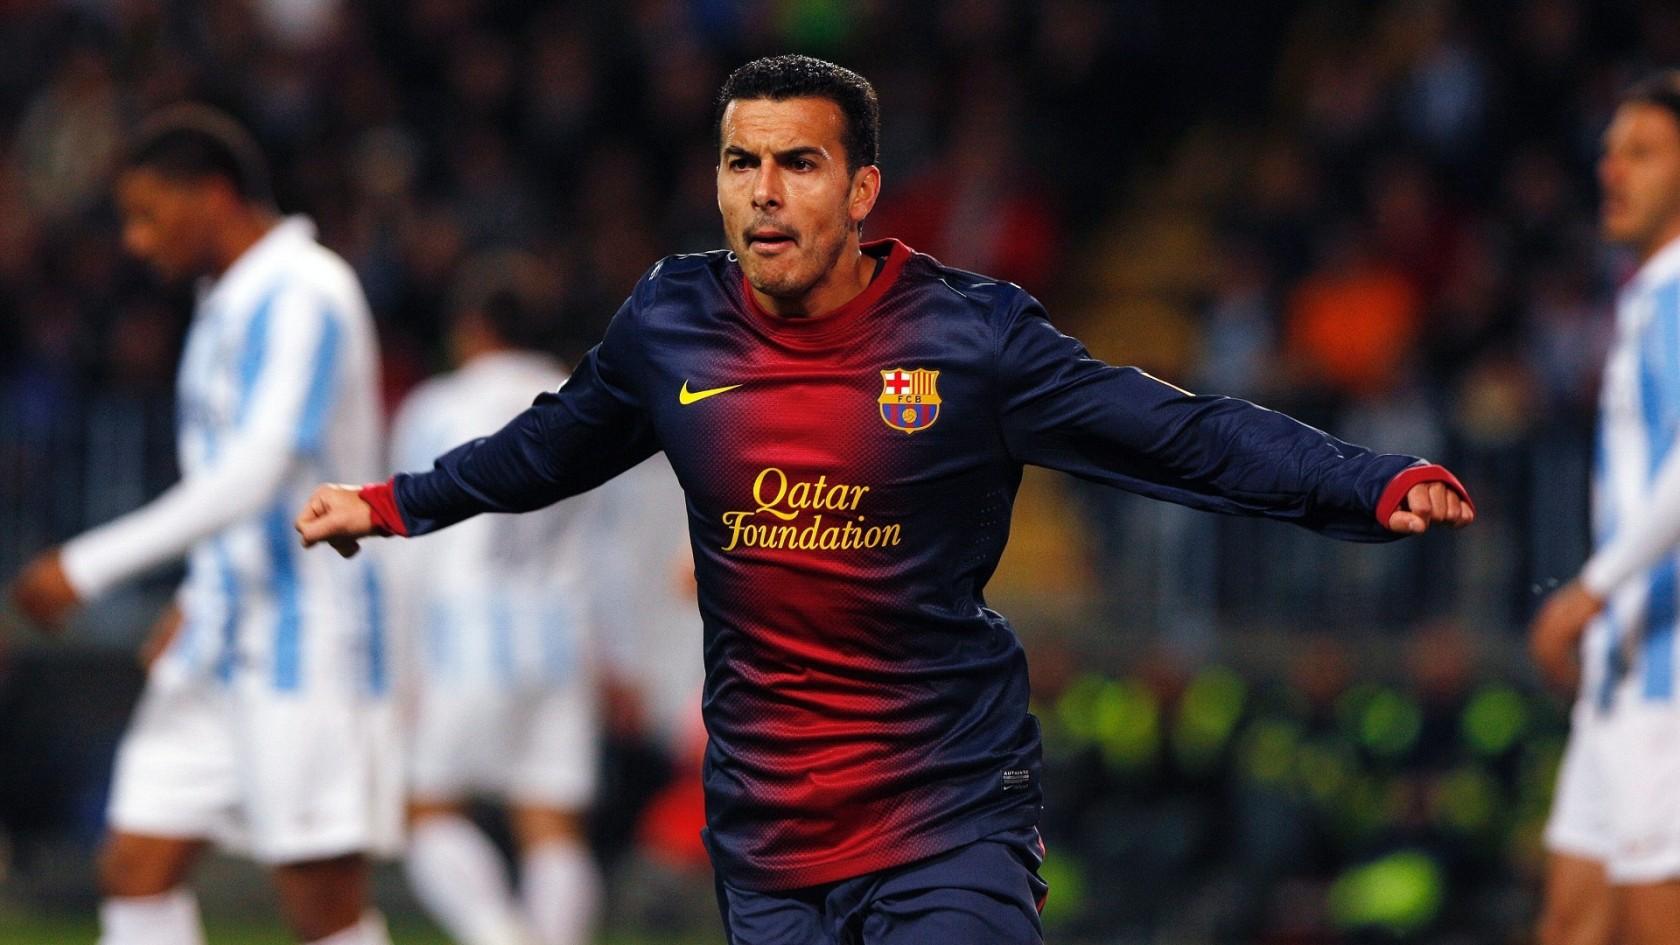 Arsenal target Barca forward